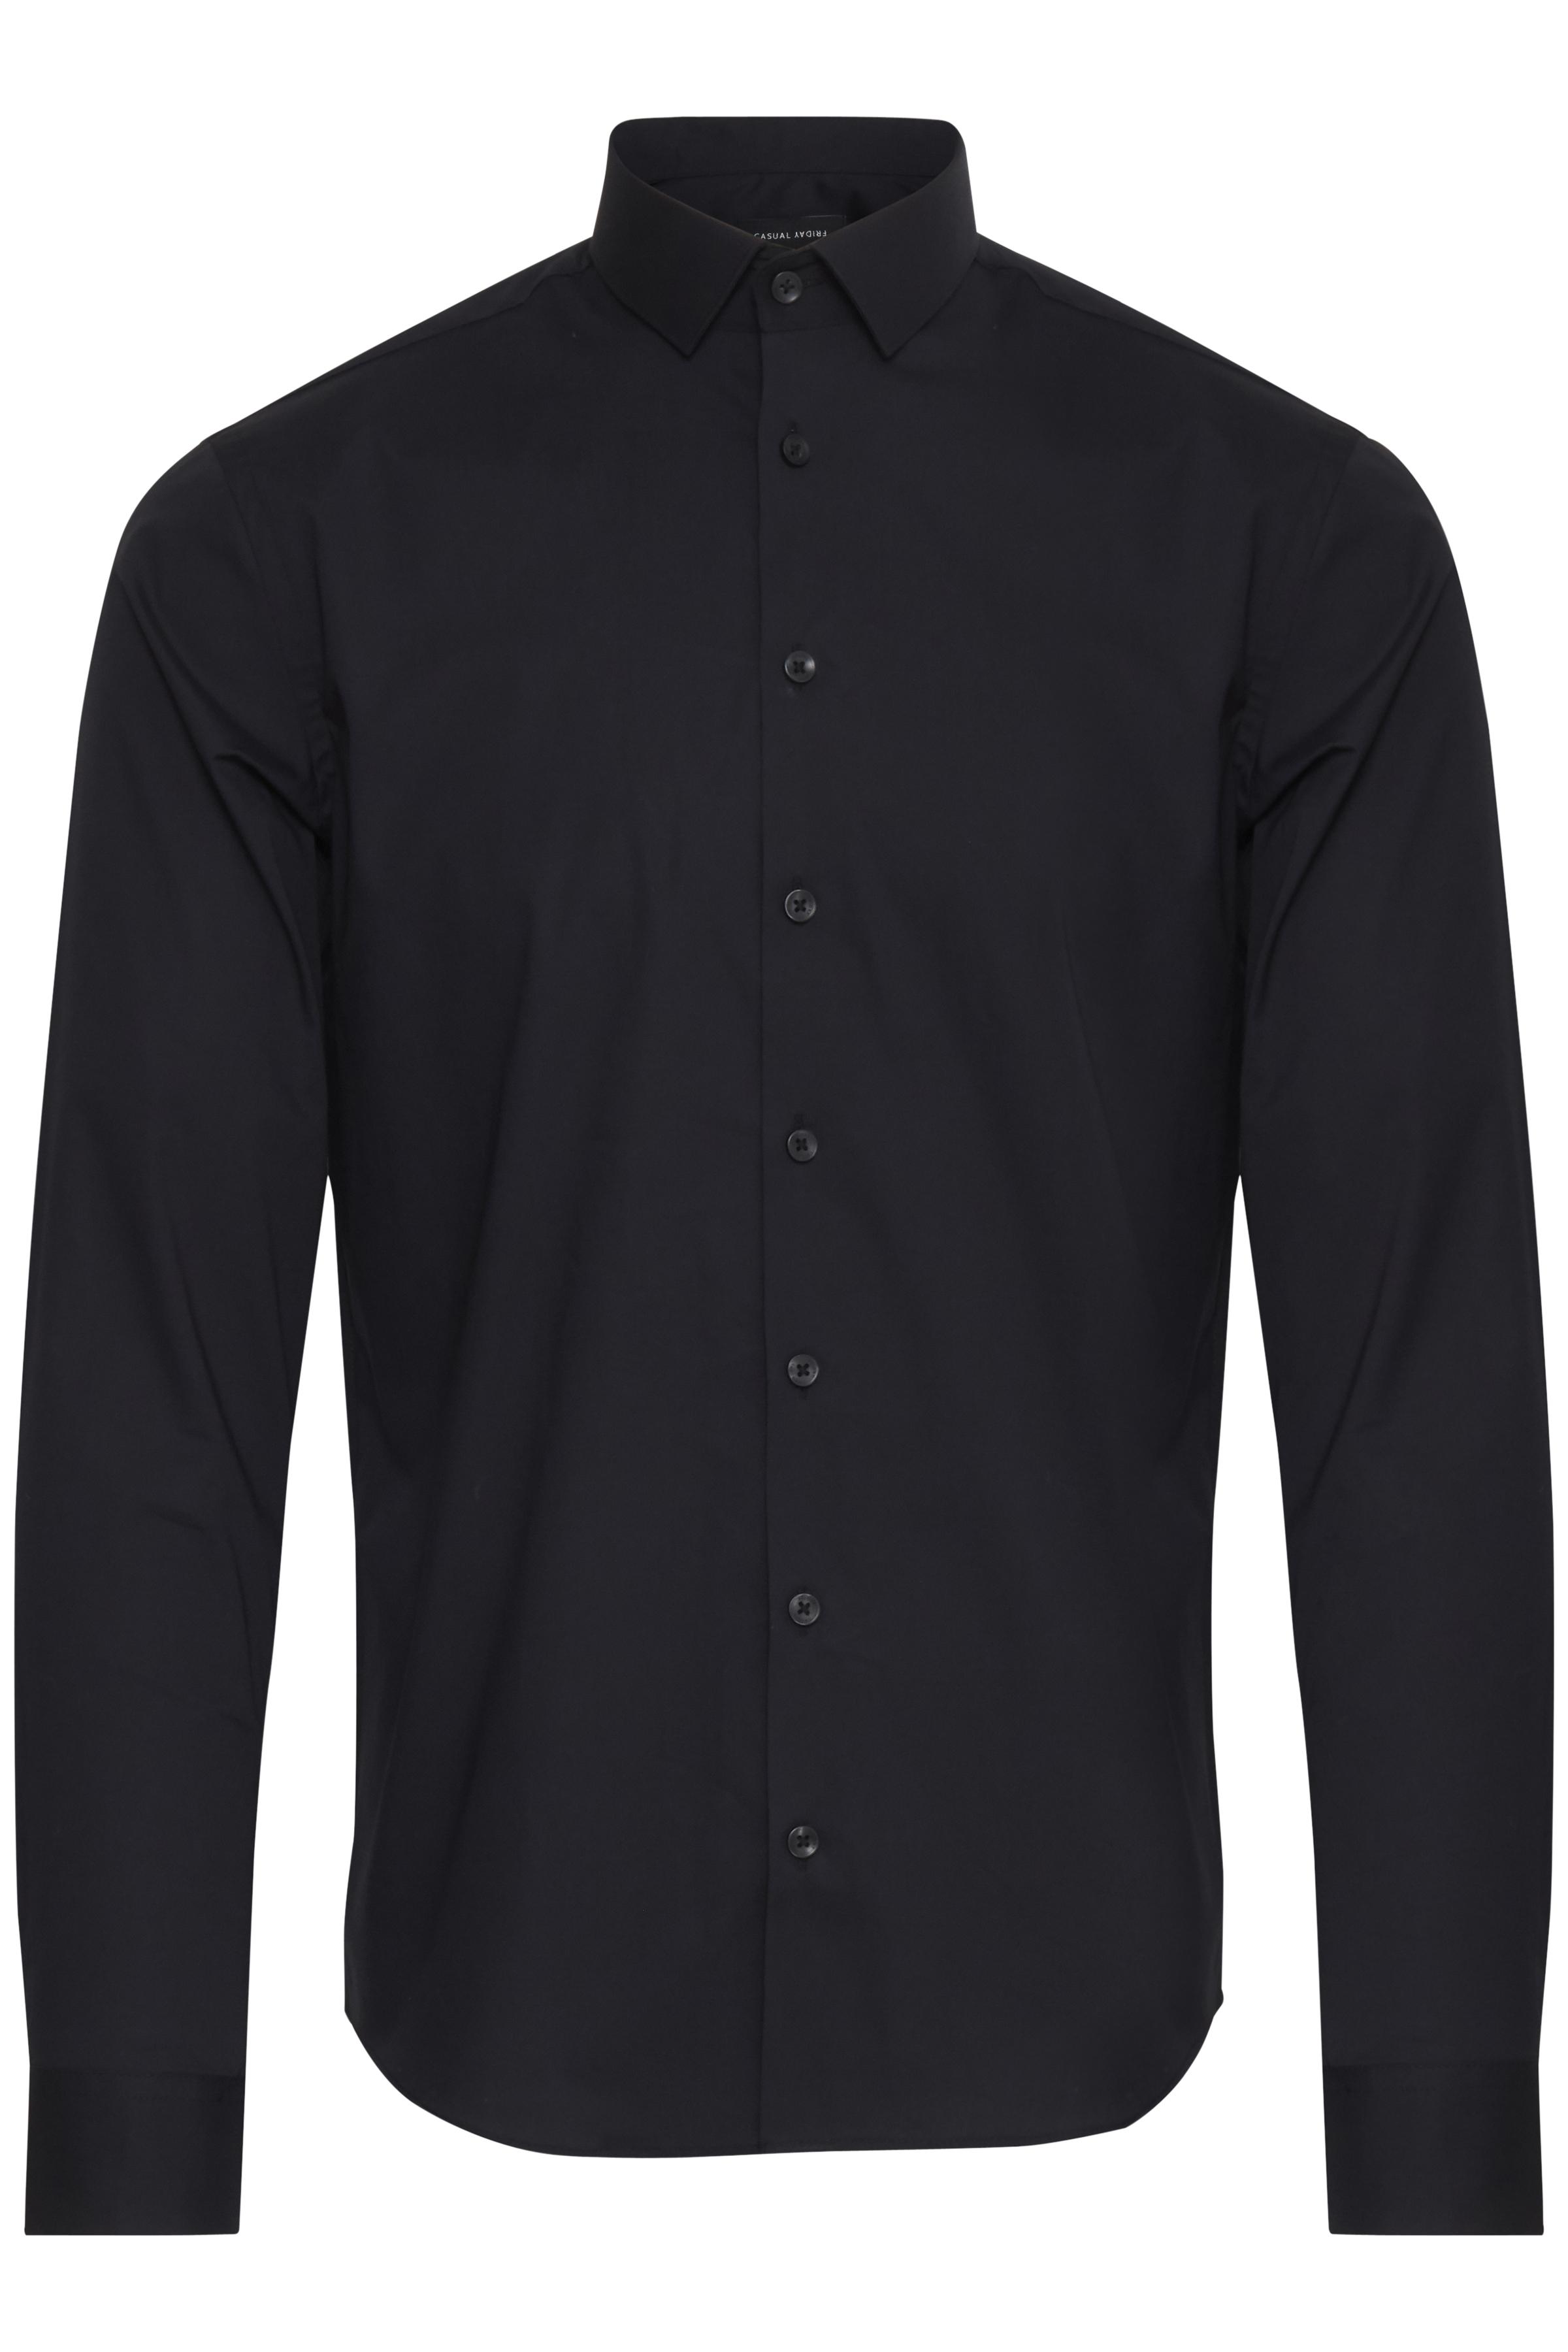 Image of Casual Friday Herre Flot skjorte - Black